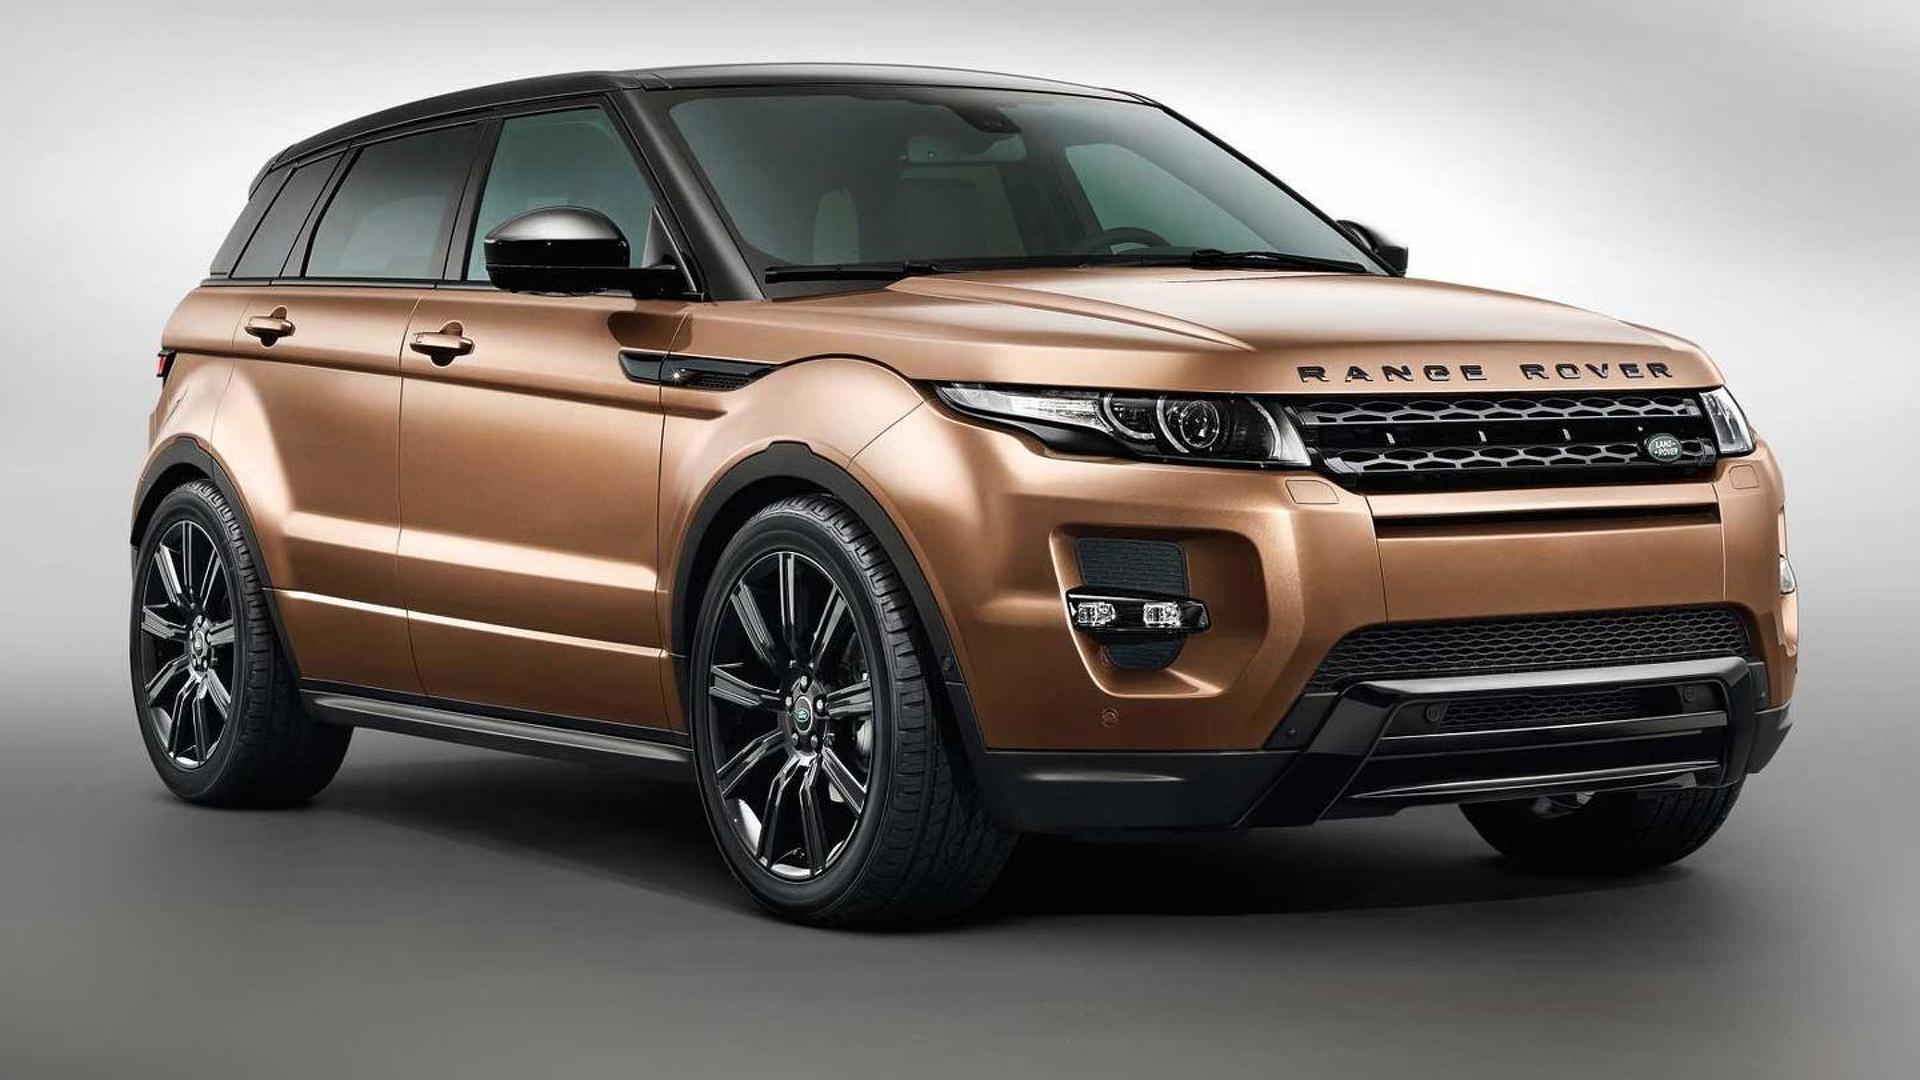 Range Rover Evoque XL set for 2016 arrival - report